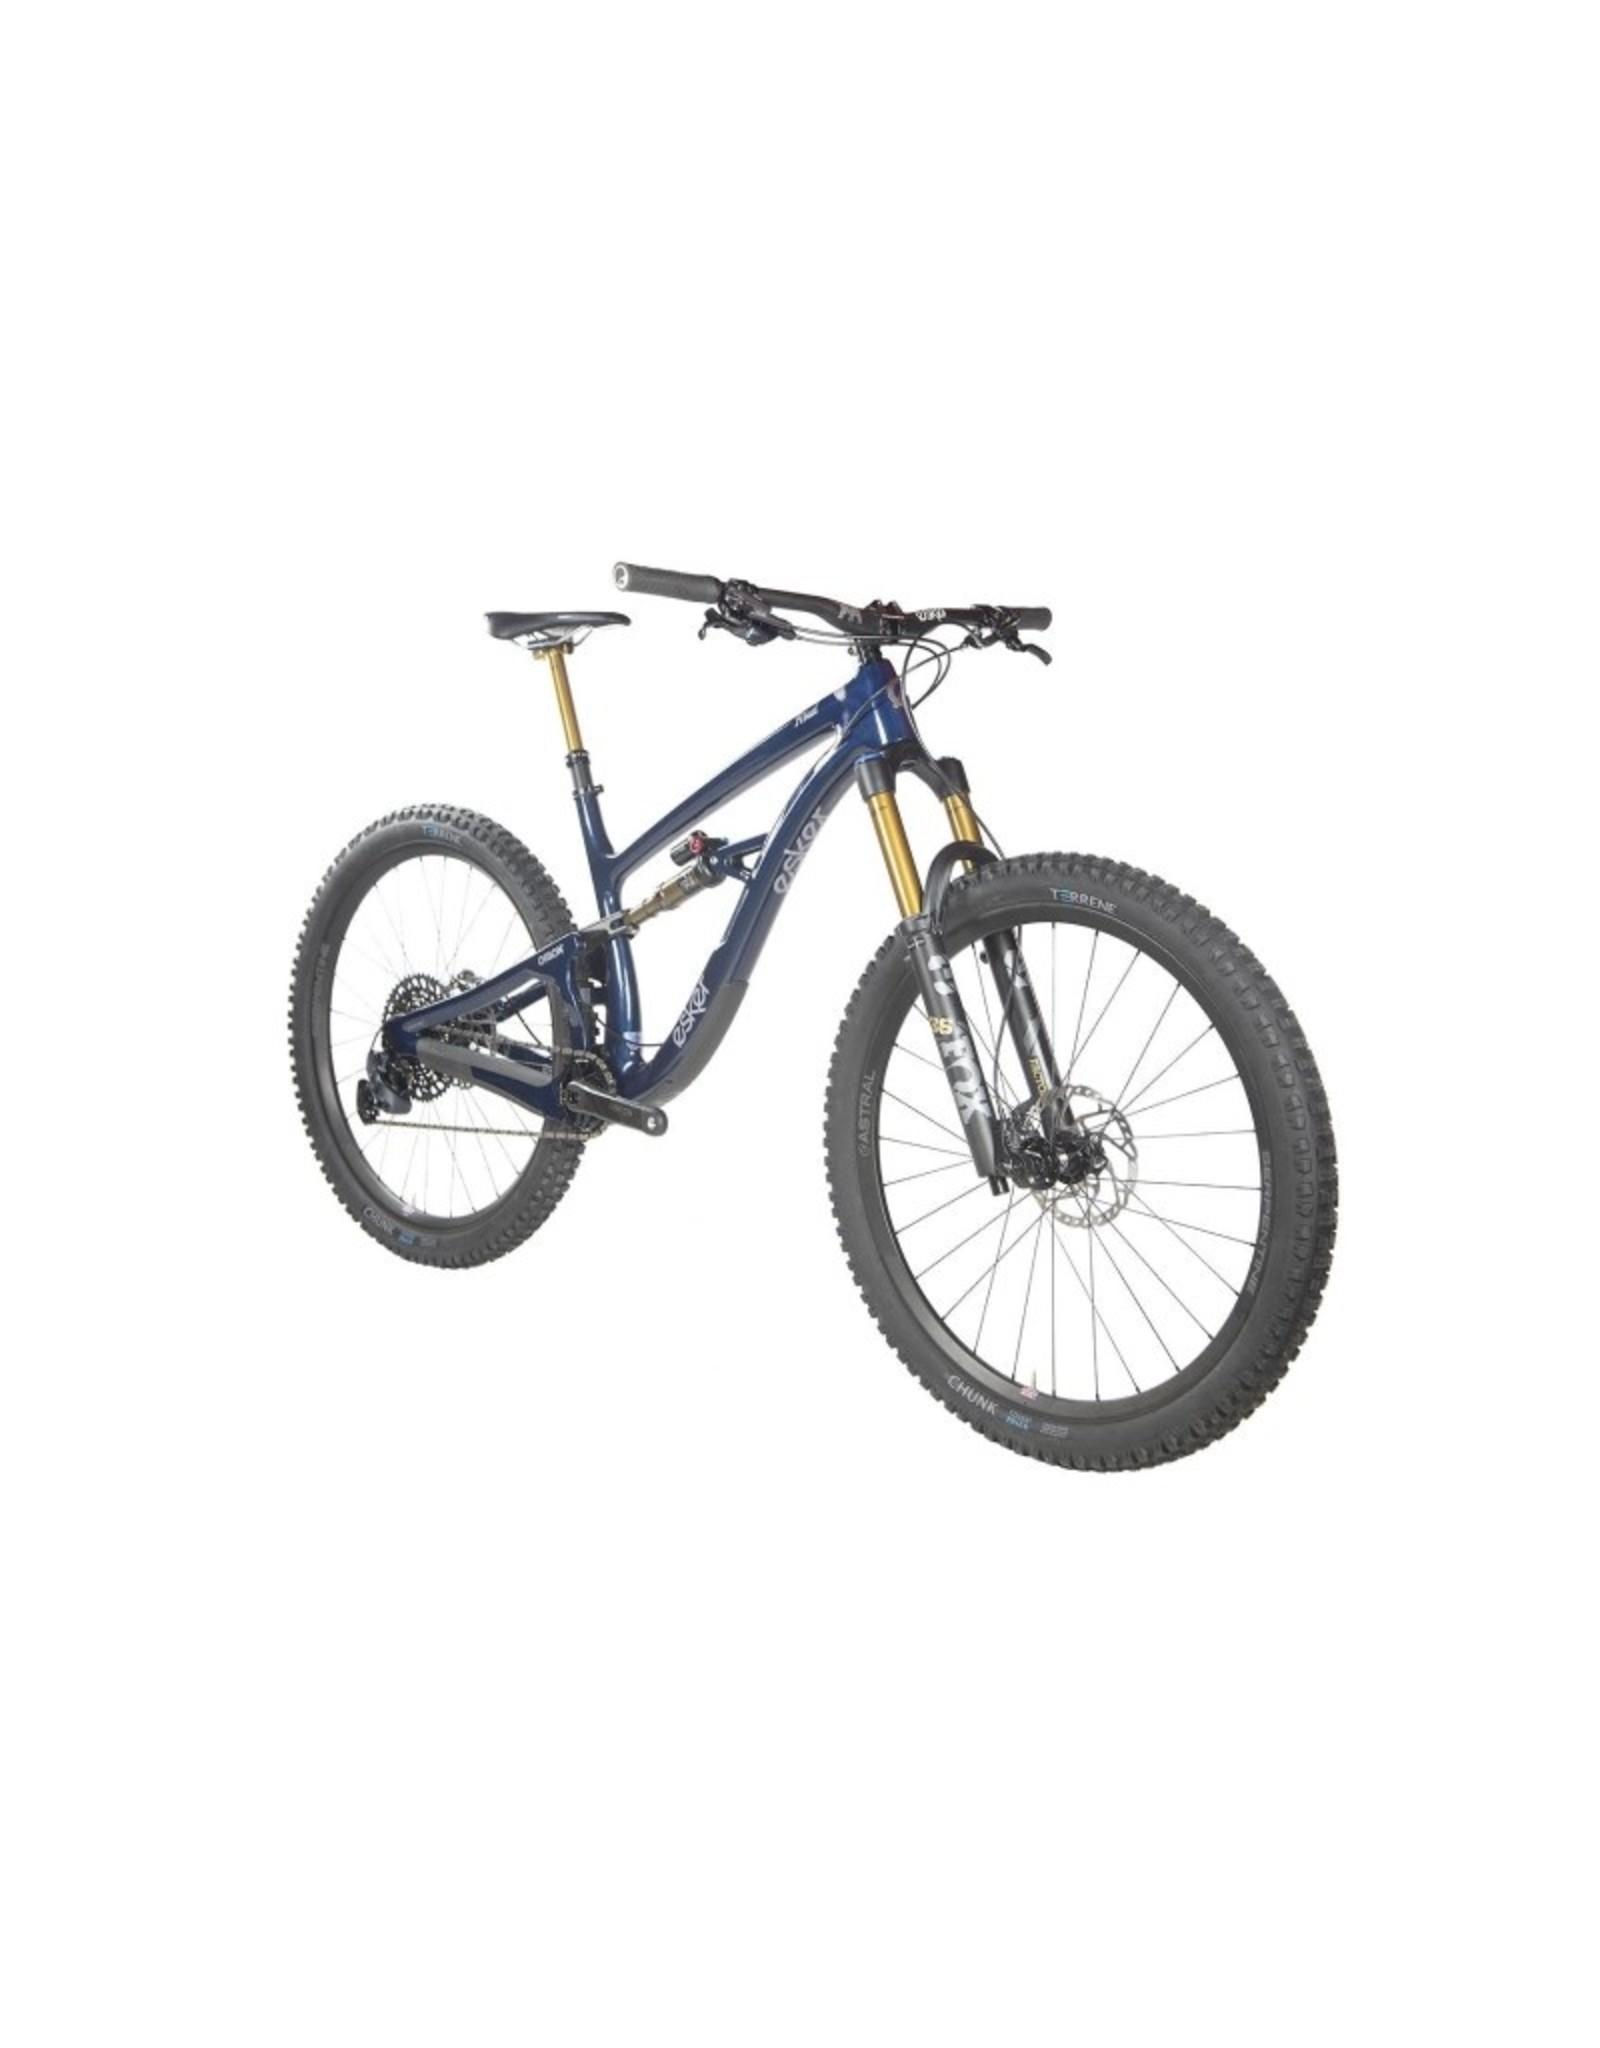 Esker Cycles Rowl Carbon 29 R2